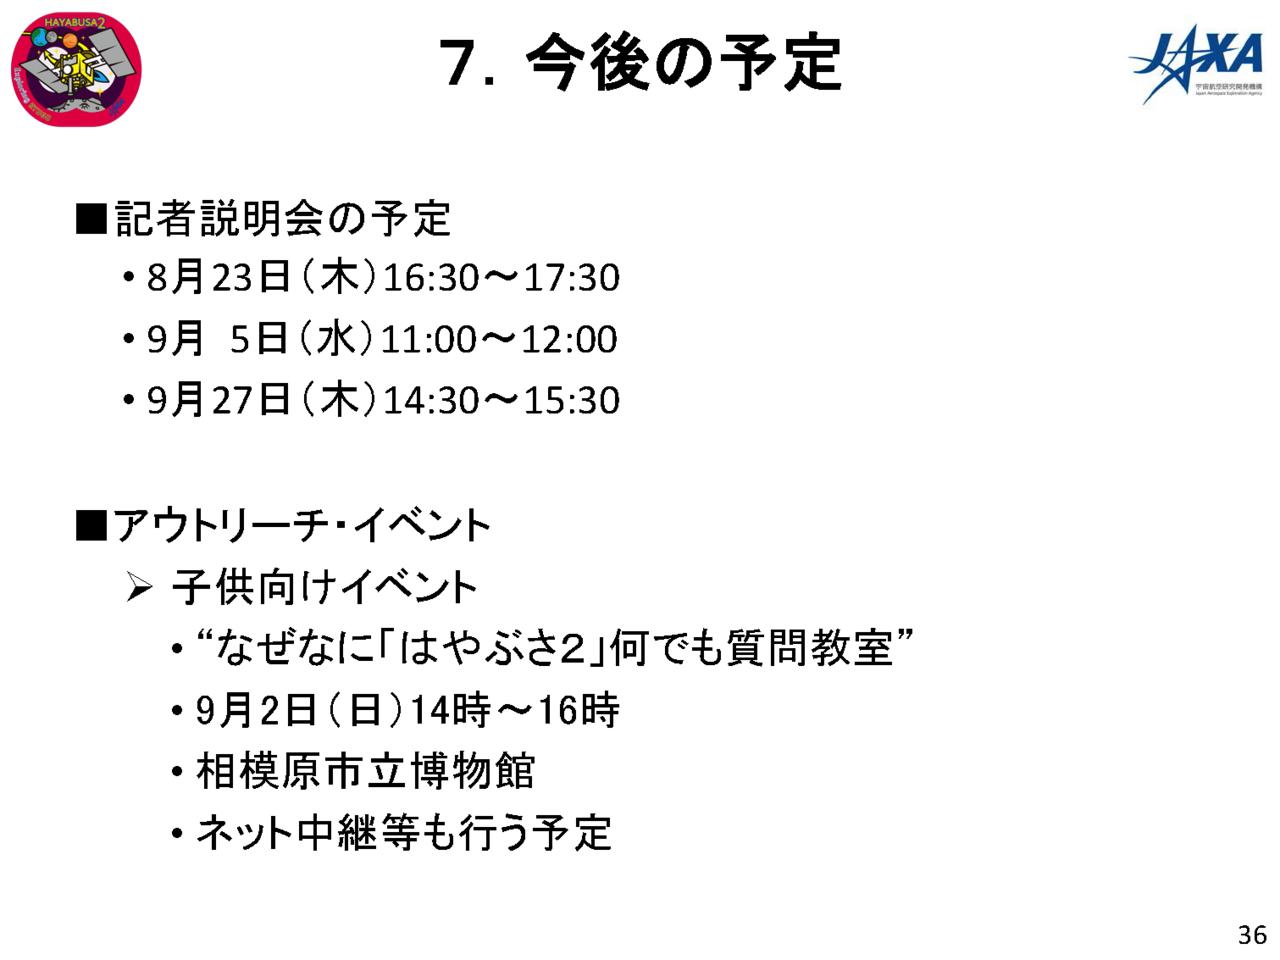 f:id:Imamura:20180802145956p:plain